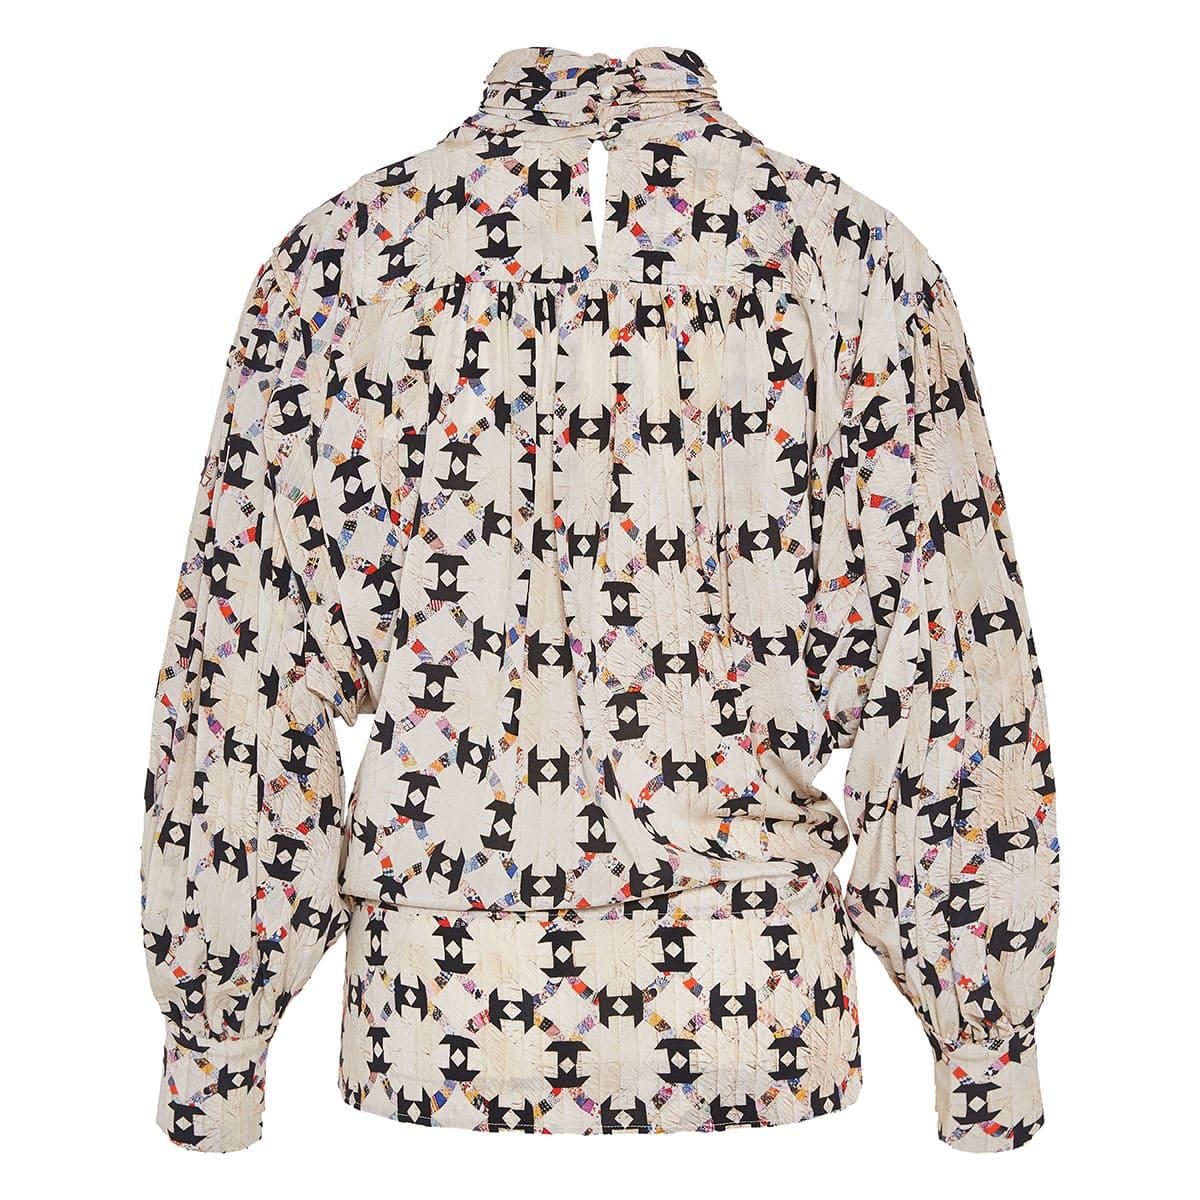 Brandi balloon-sleeved printed blouse